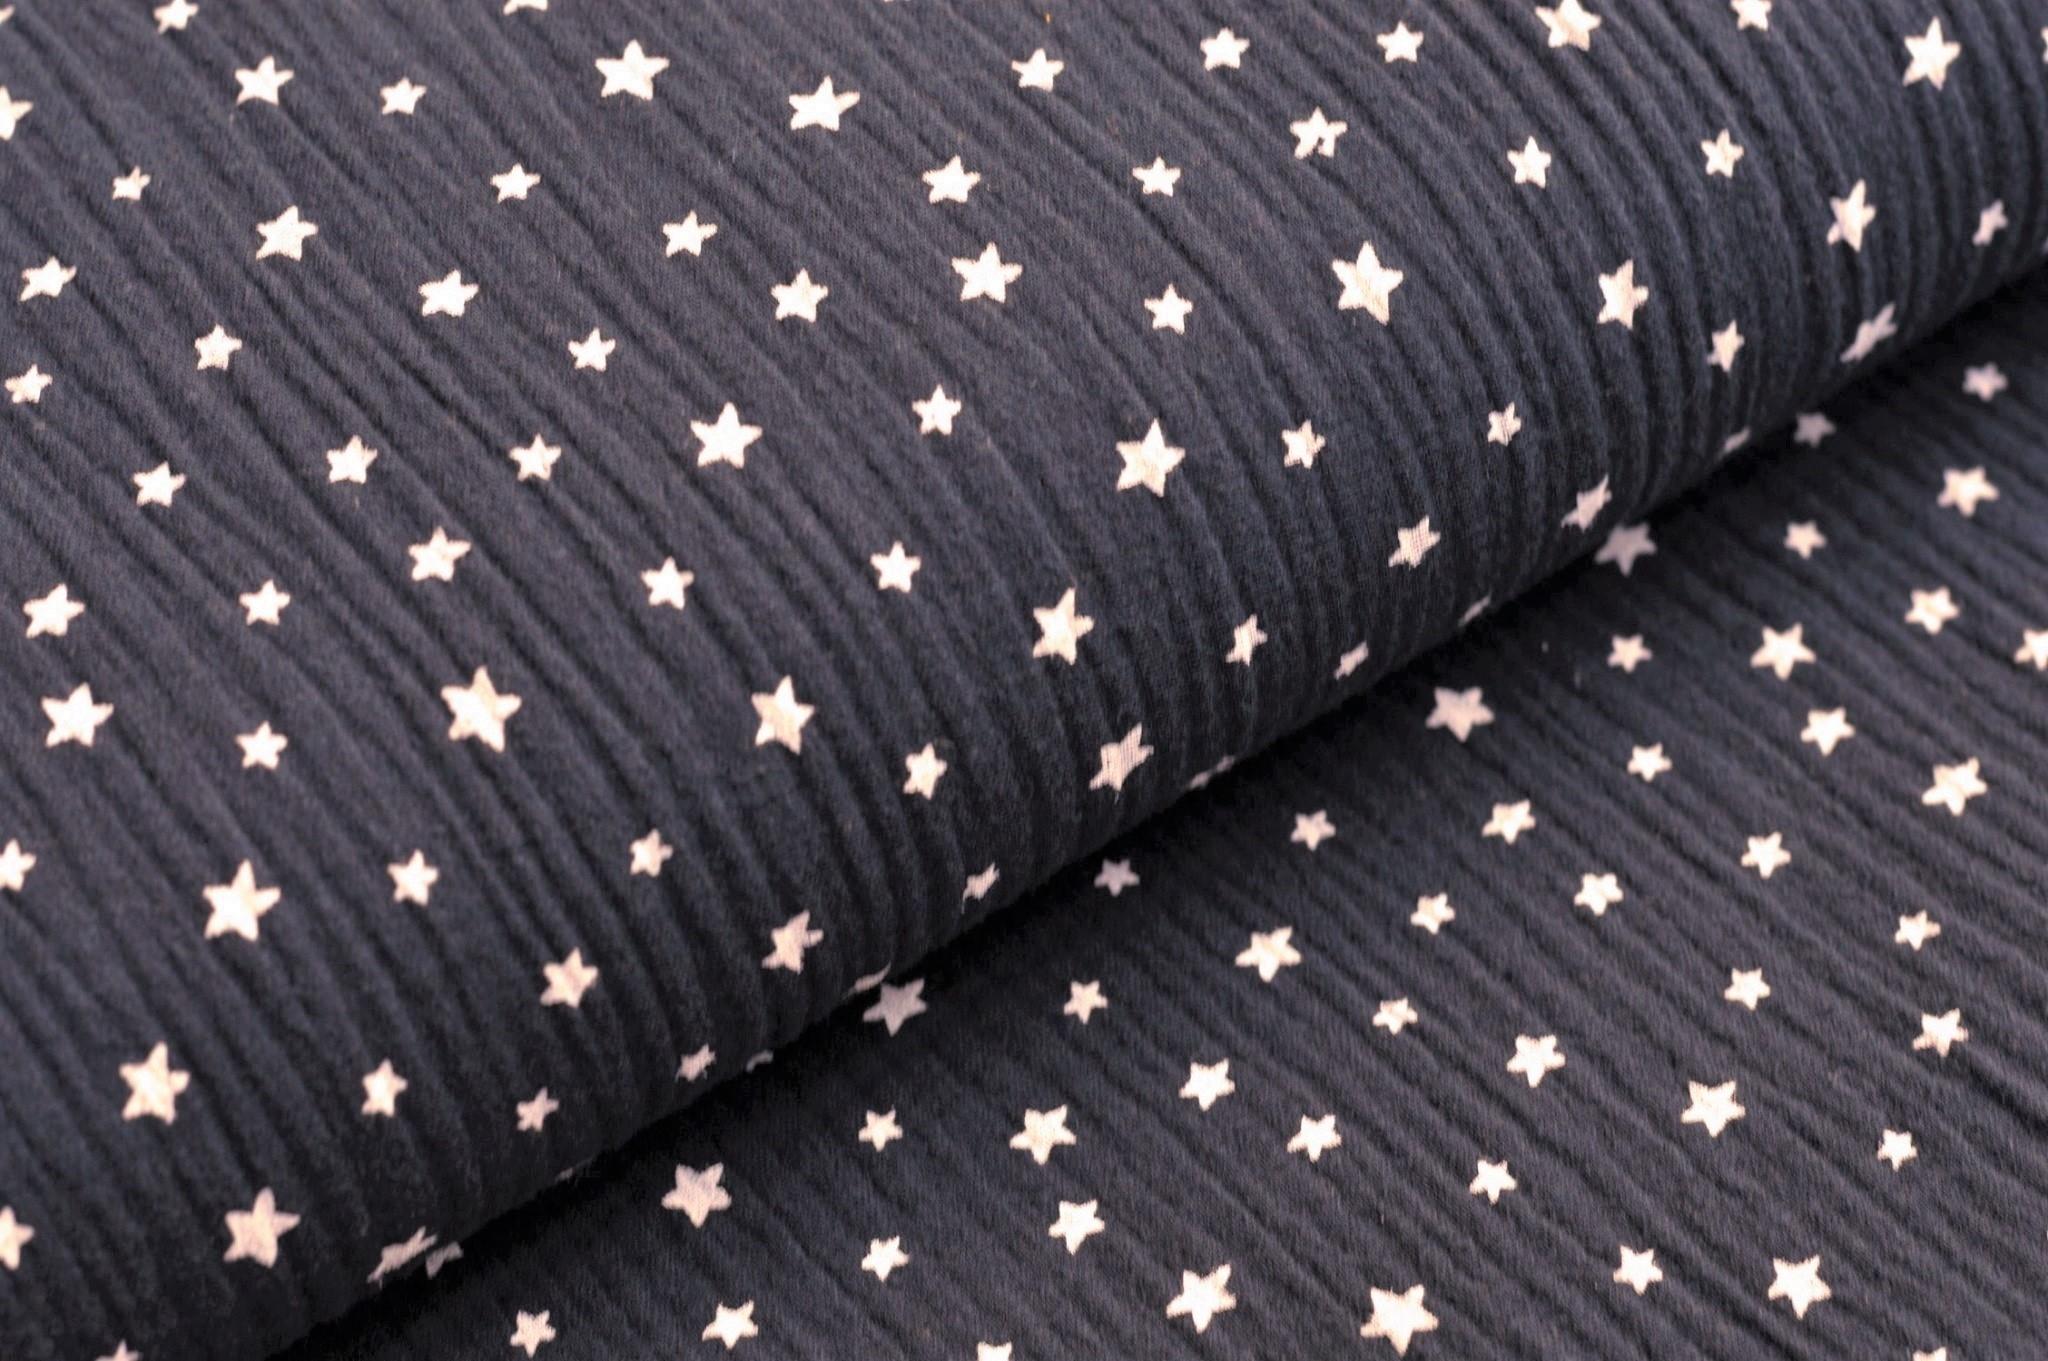 Baumwolle Musselin Double Gauze dunkelblau mit weissen Sternen